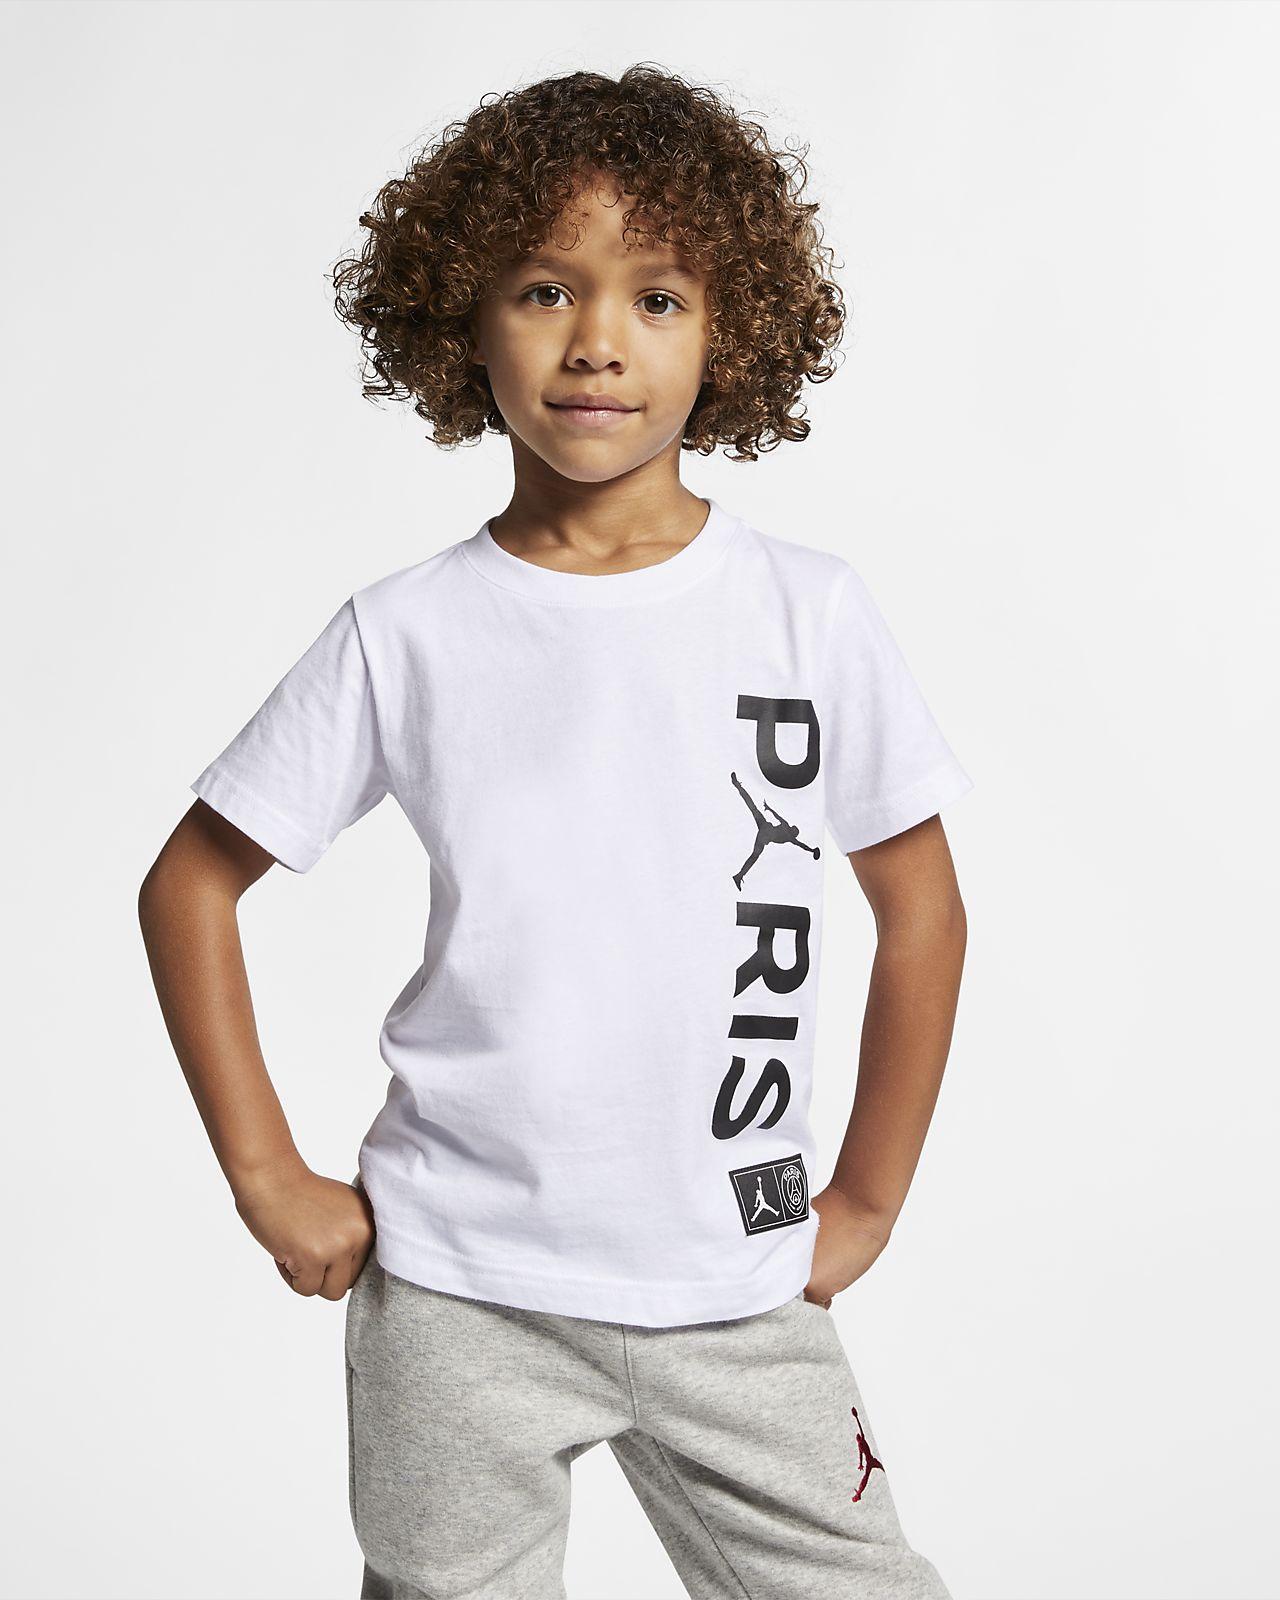 París Saint-Germain Camiseta - Niño/a pequeño/a